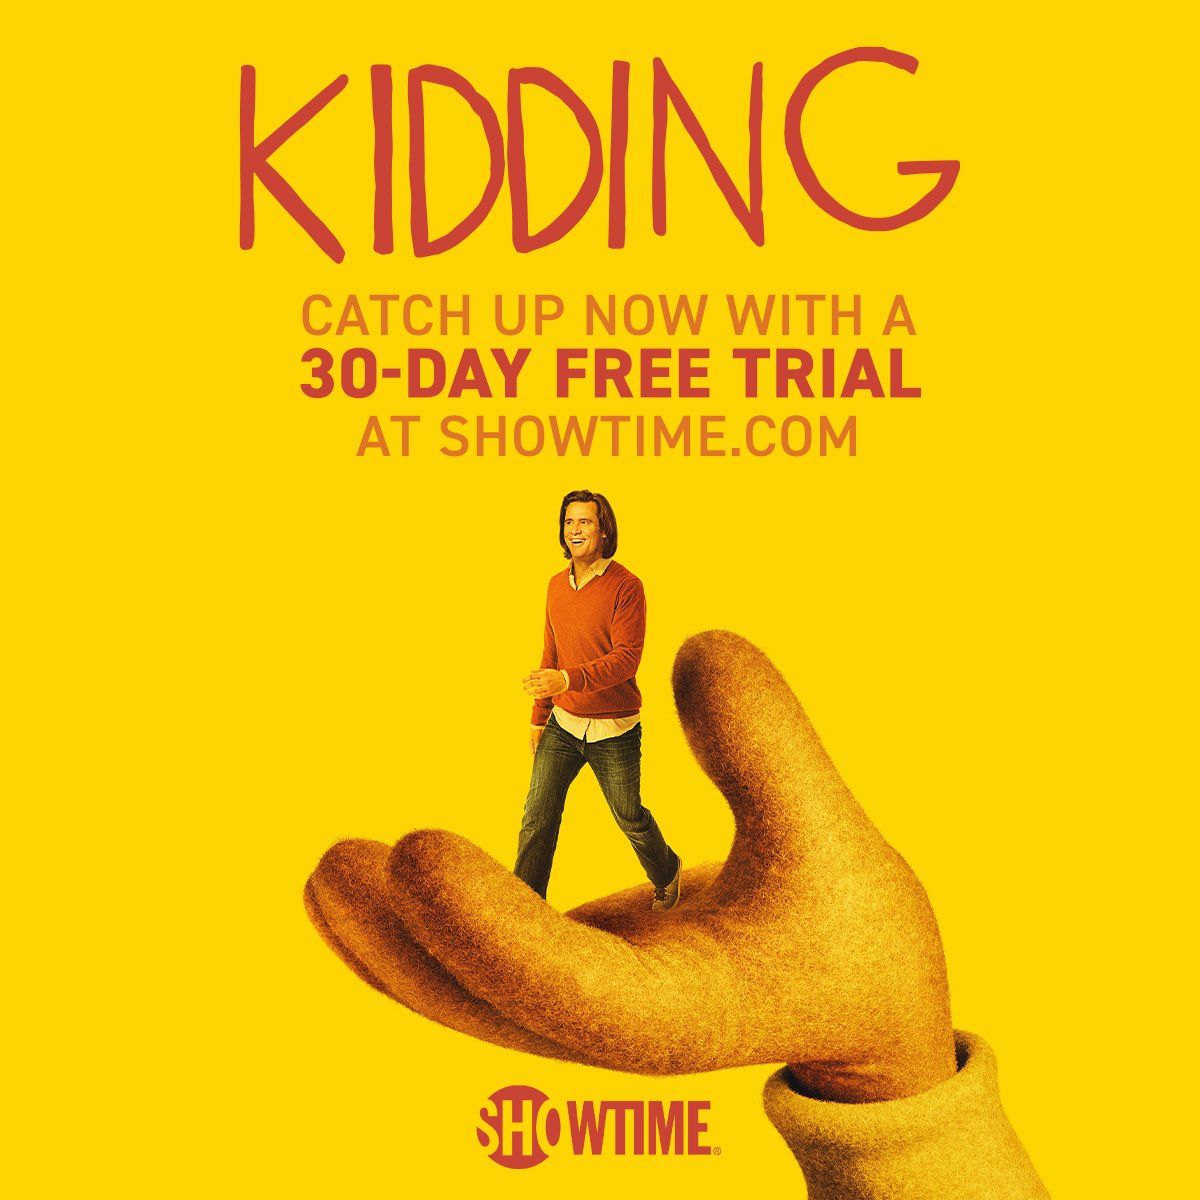 Free Showtime for your quarantine binging! Watch #Kidding Stay safe! @SHOKidding https://t.co/NigOmf4b0W